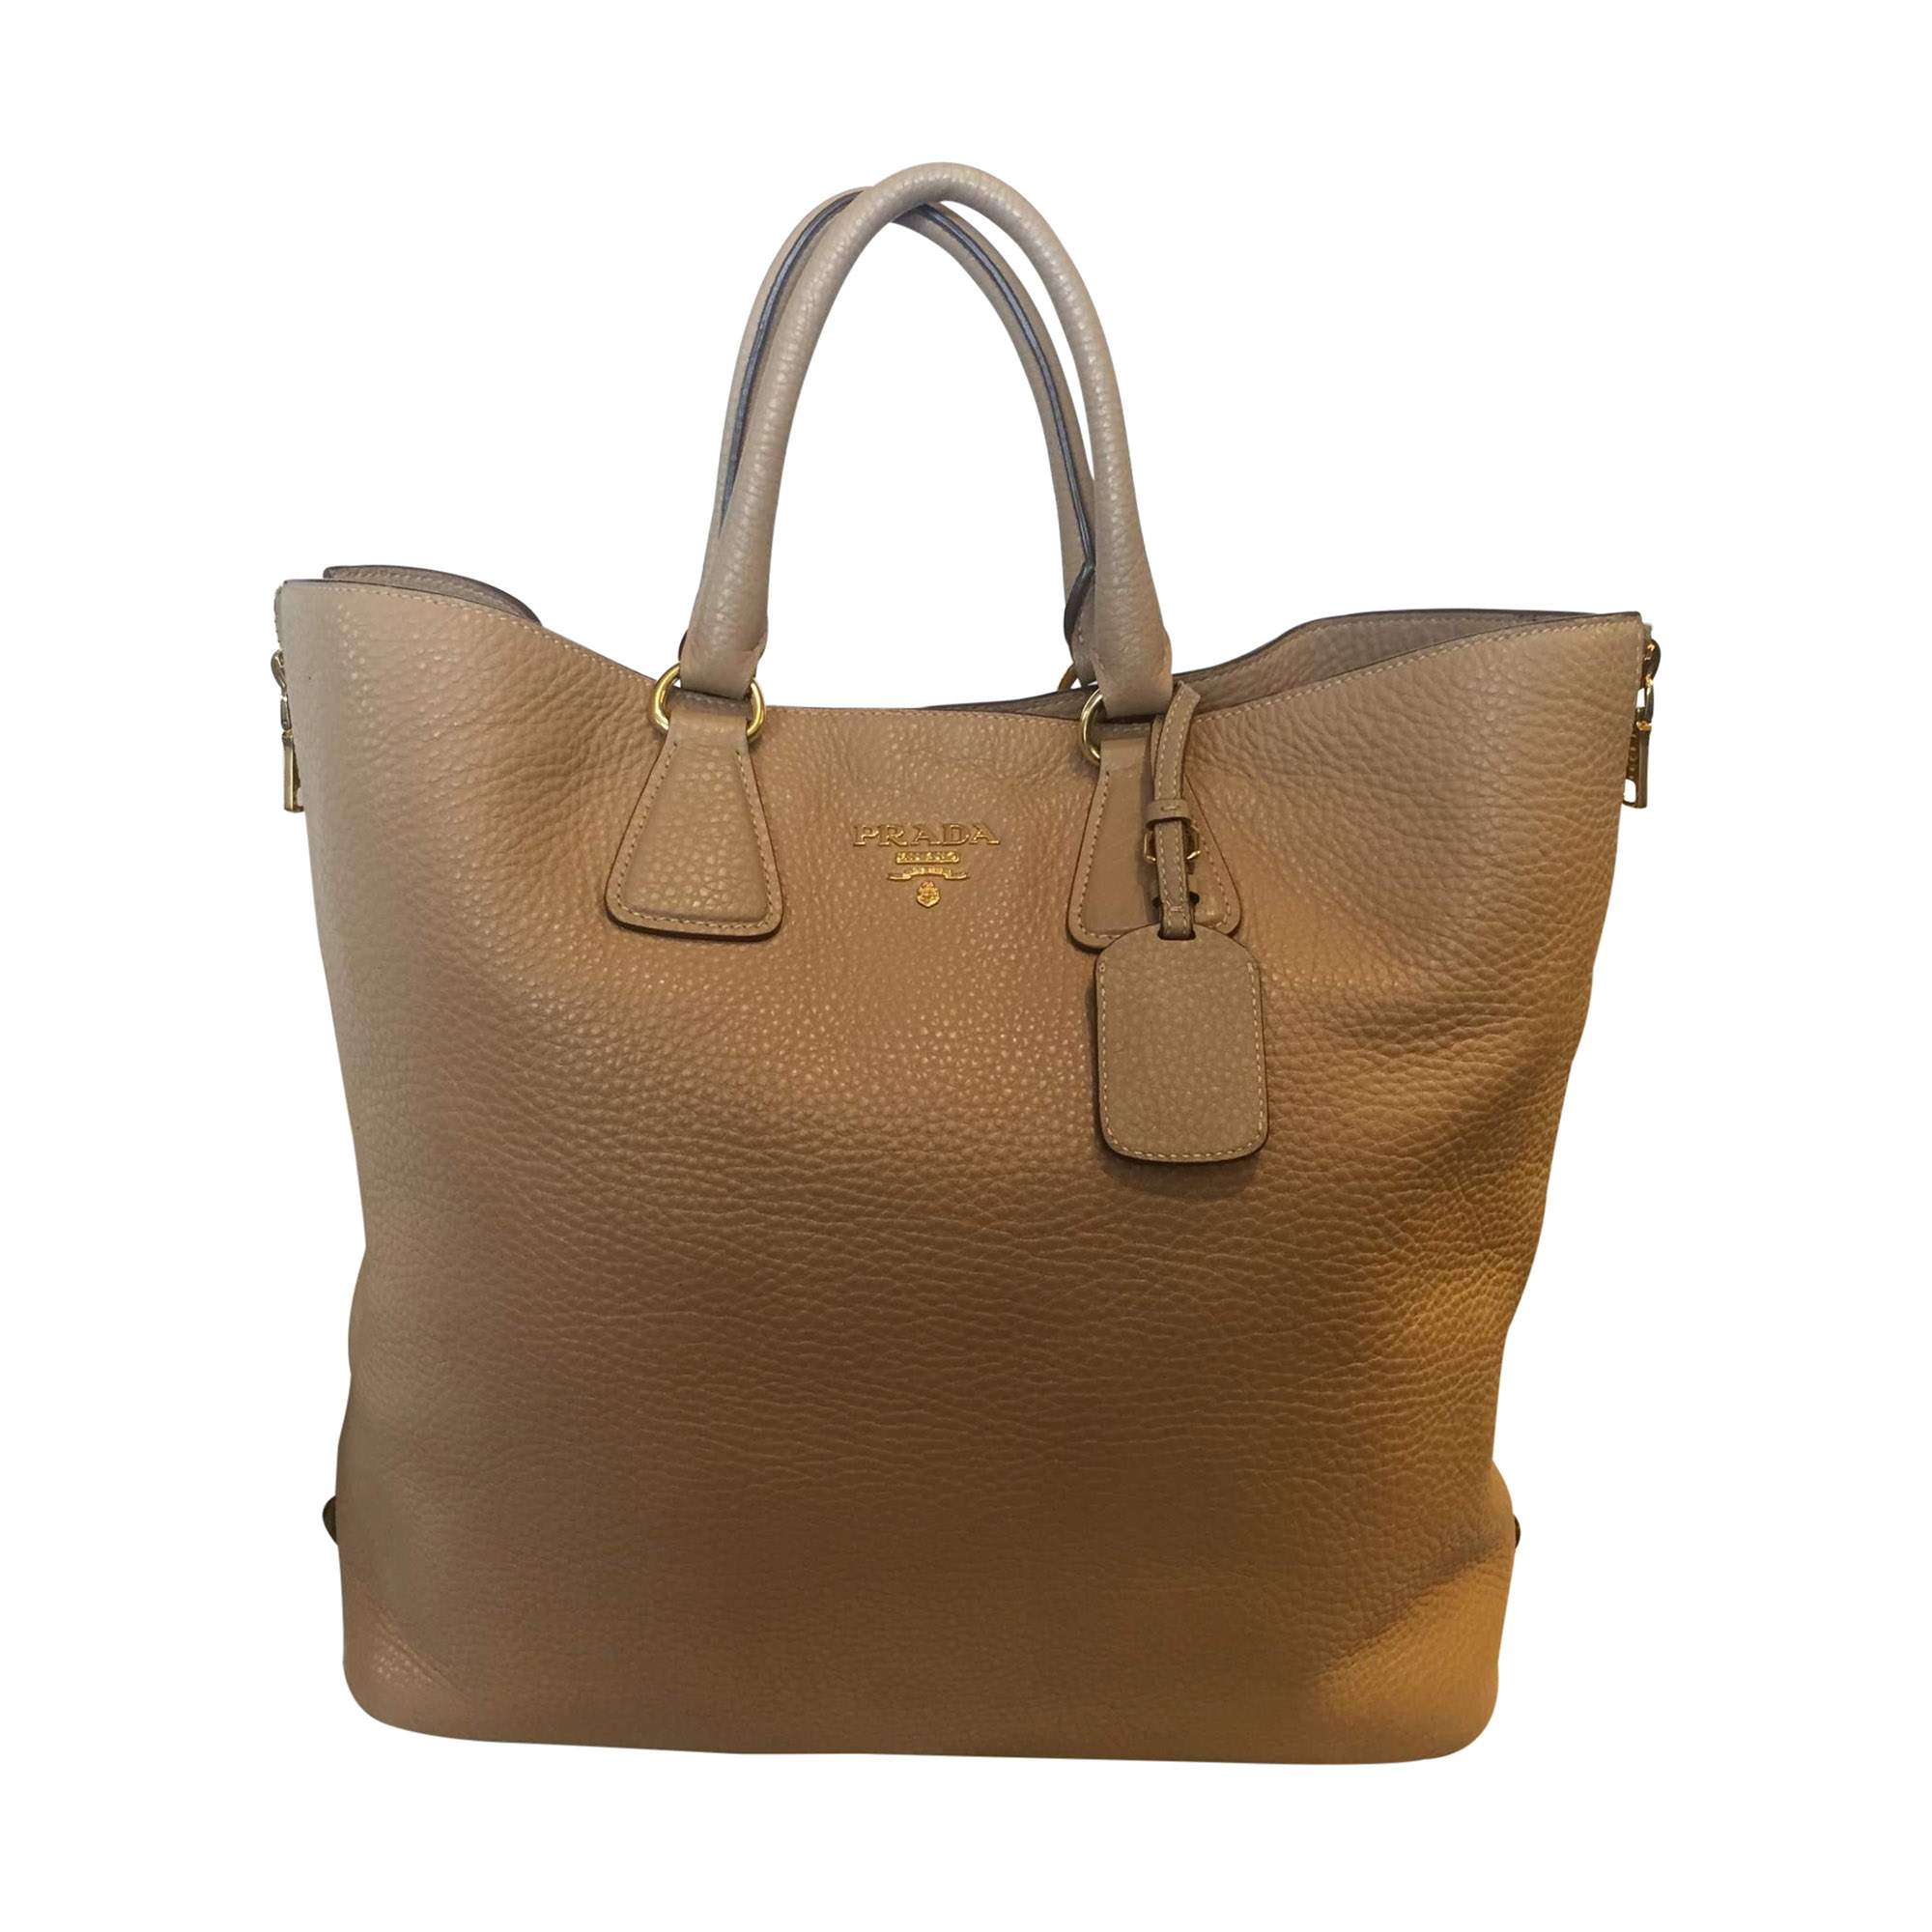 836e1521 Prada Beige Vitello Daino Expandable Shopper Bag | The Chic Selection